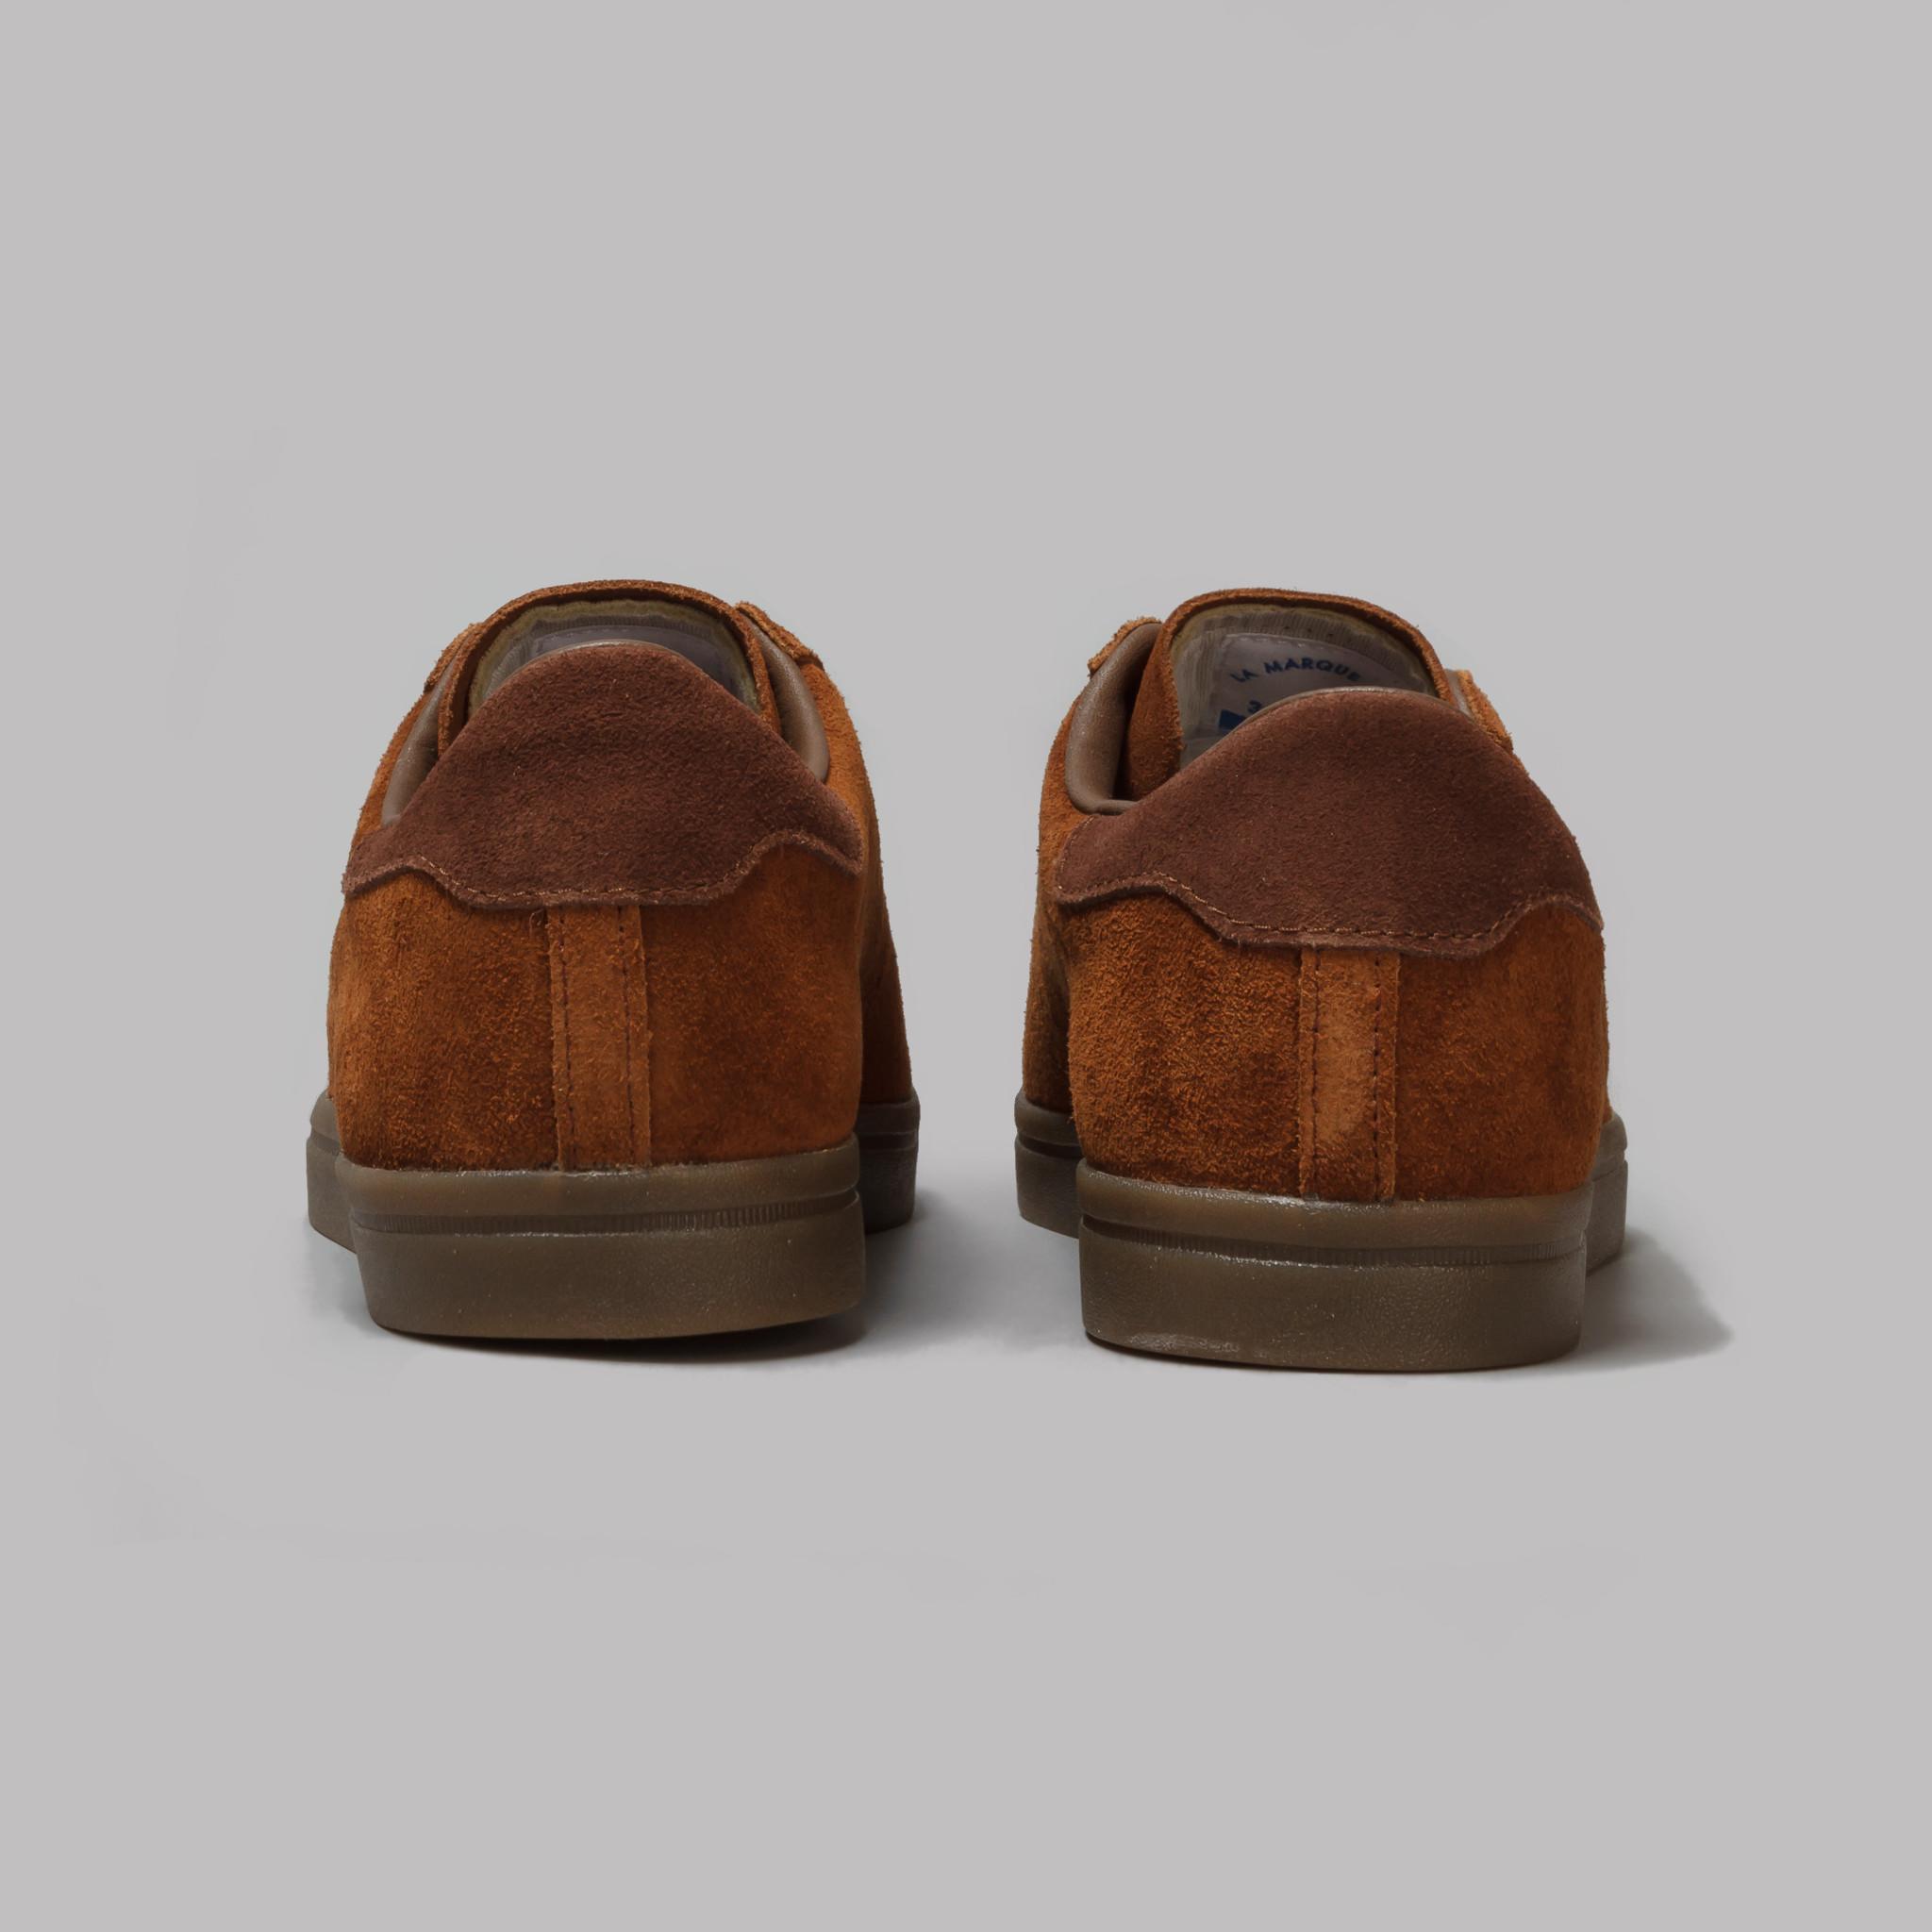 Adidas-Spezial-160316-01-03_1